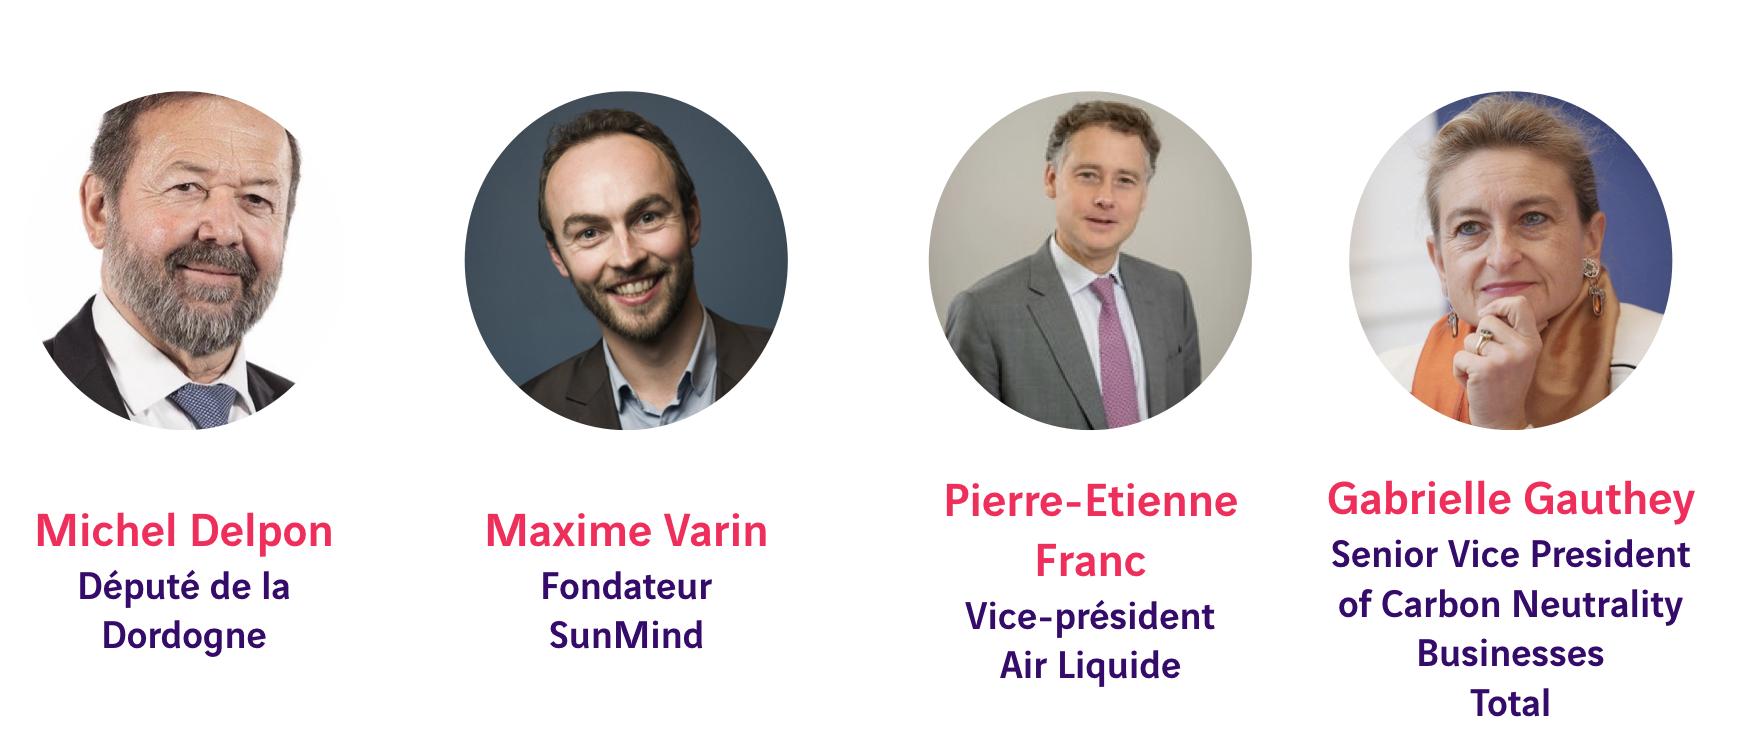 Michel Delpon, Maxime Varin, Pierre-Etienne Franc, Gabrielle Gauthey